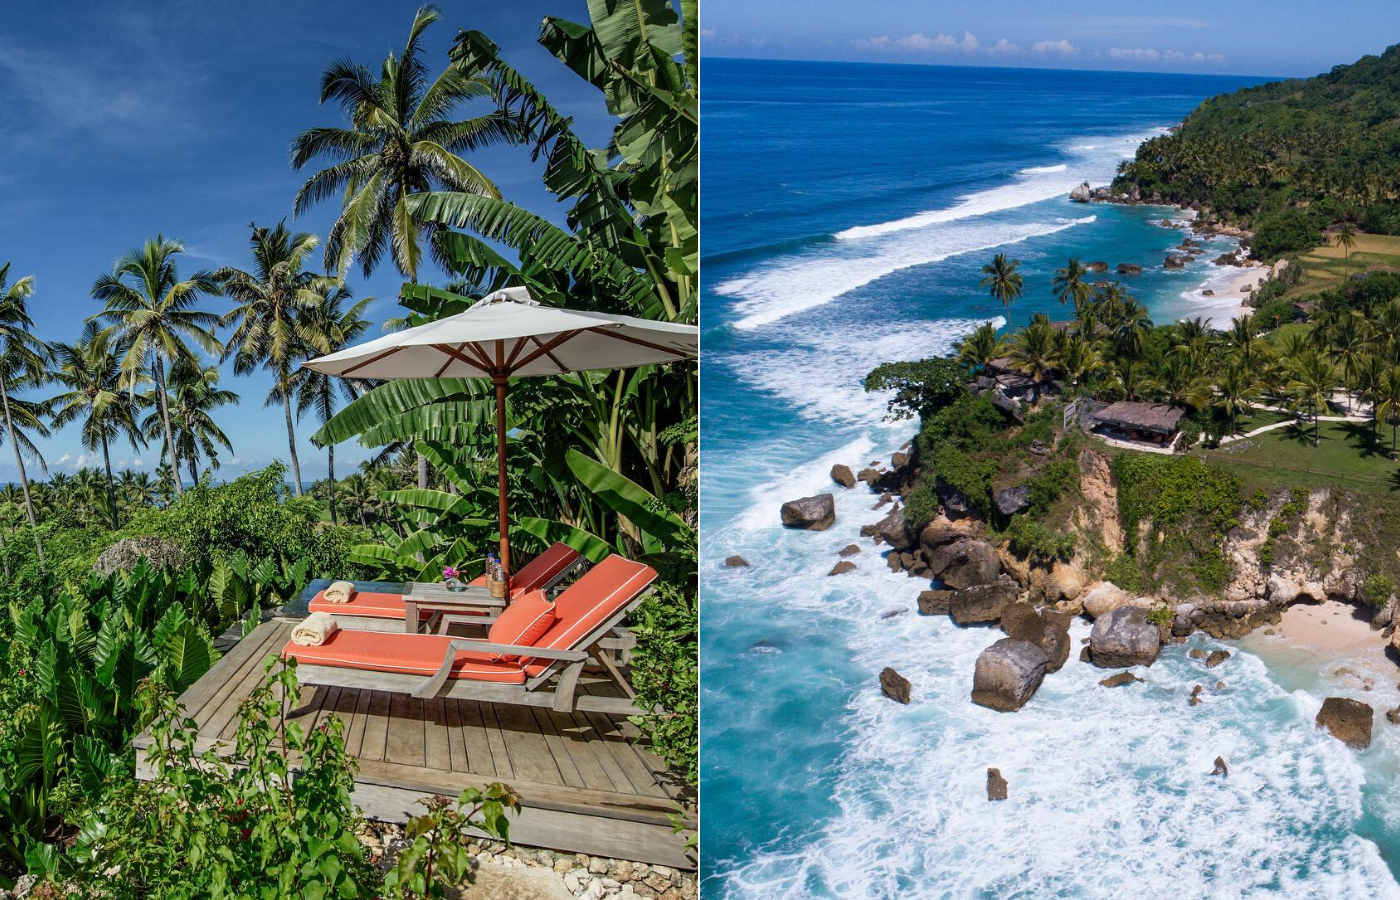 nihi sumba island | private island resorts in Southeast Asia